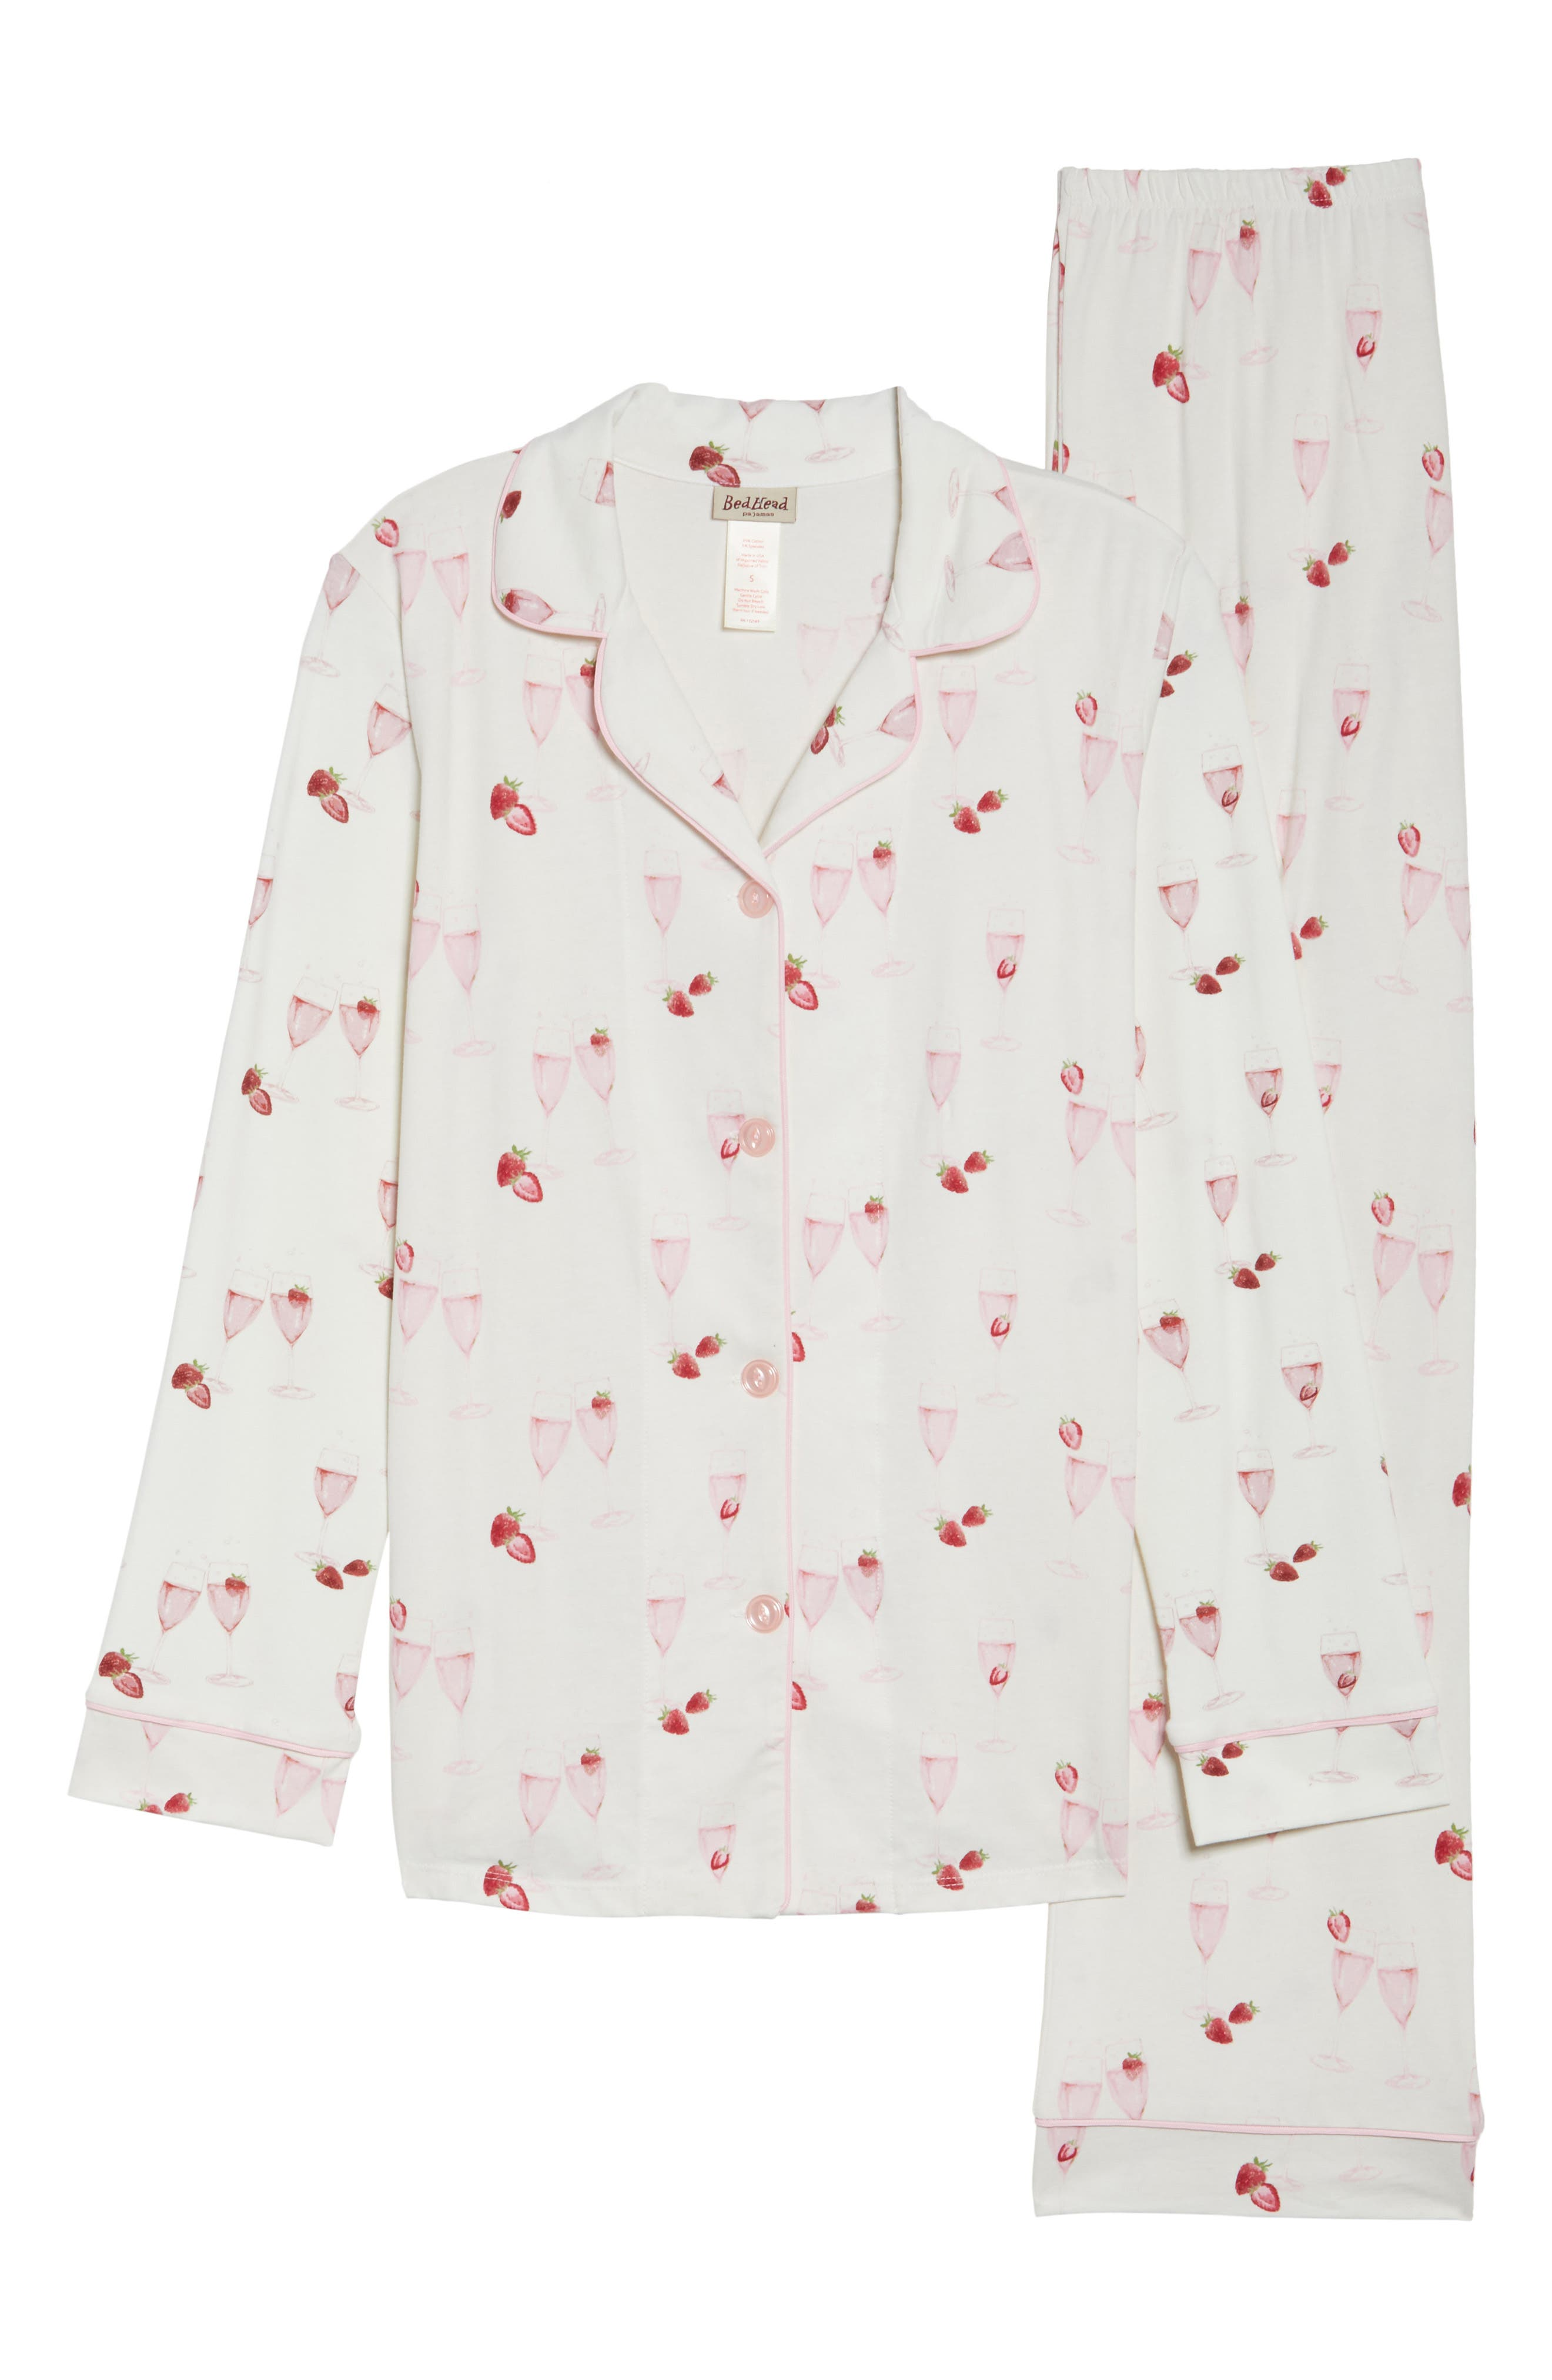 Strawberries & Champagne Print Pajamas,                             Alternate thumbnail 6, color,                             111